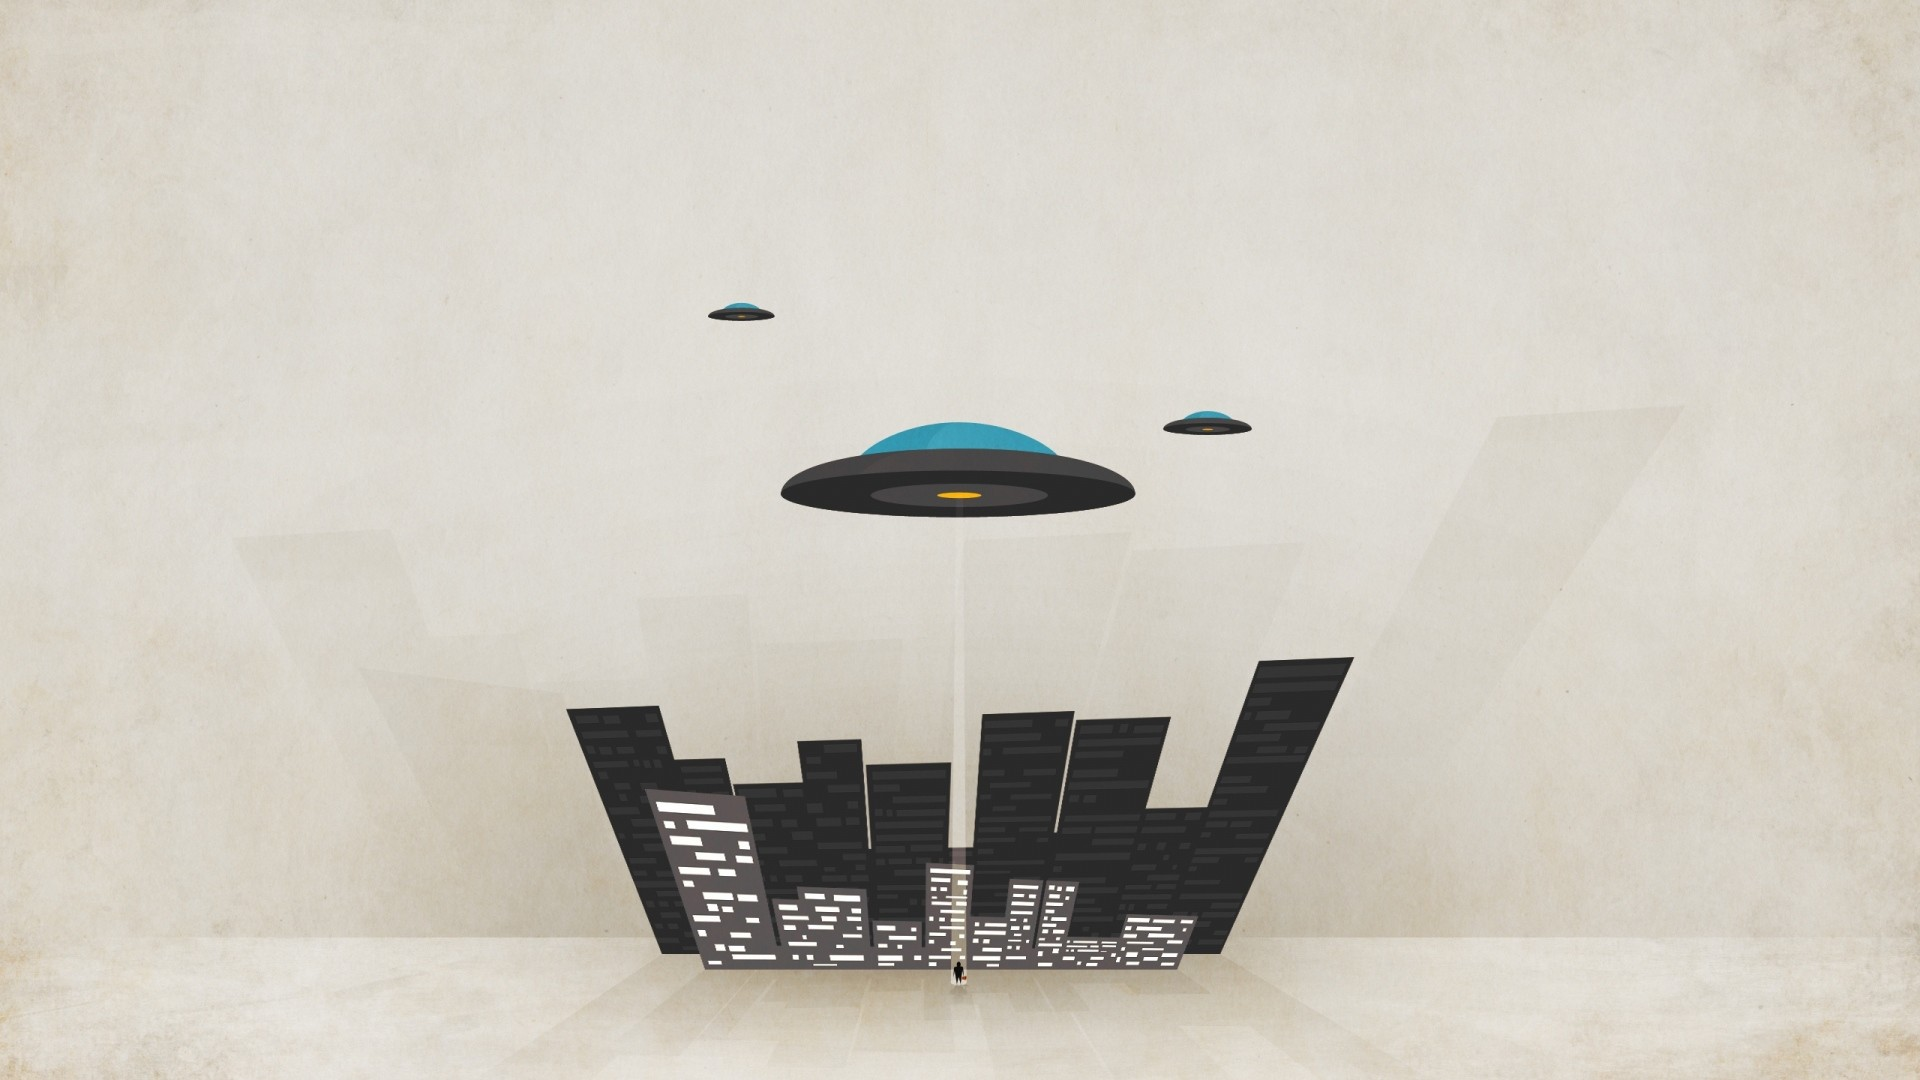 Preview wallpaper plates, minimal walls, city, ufo, minimalism, flying  1920×1080